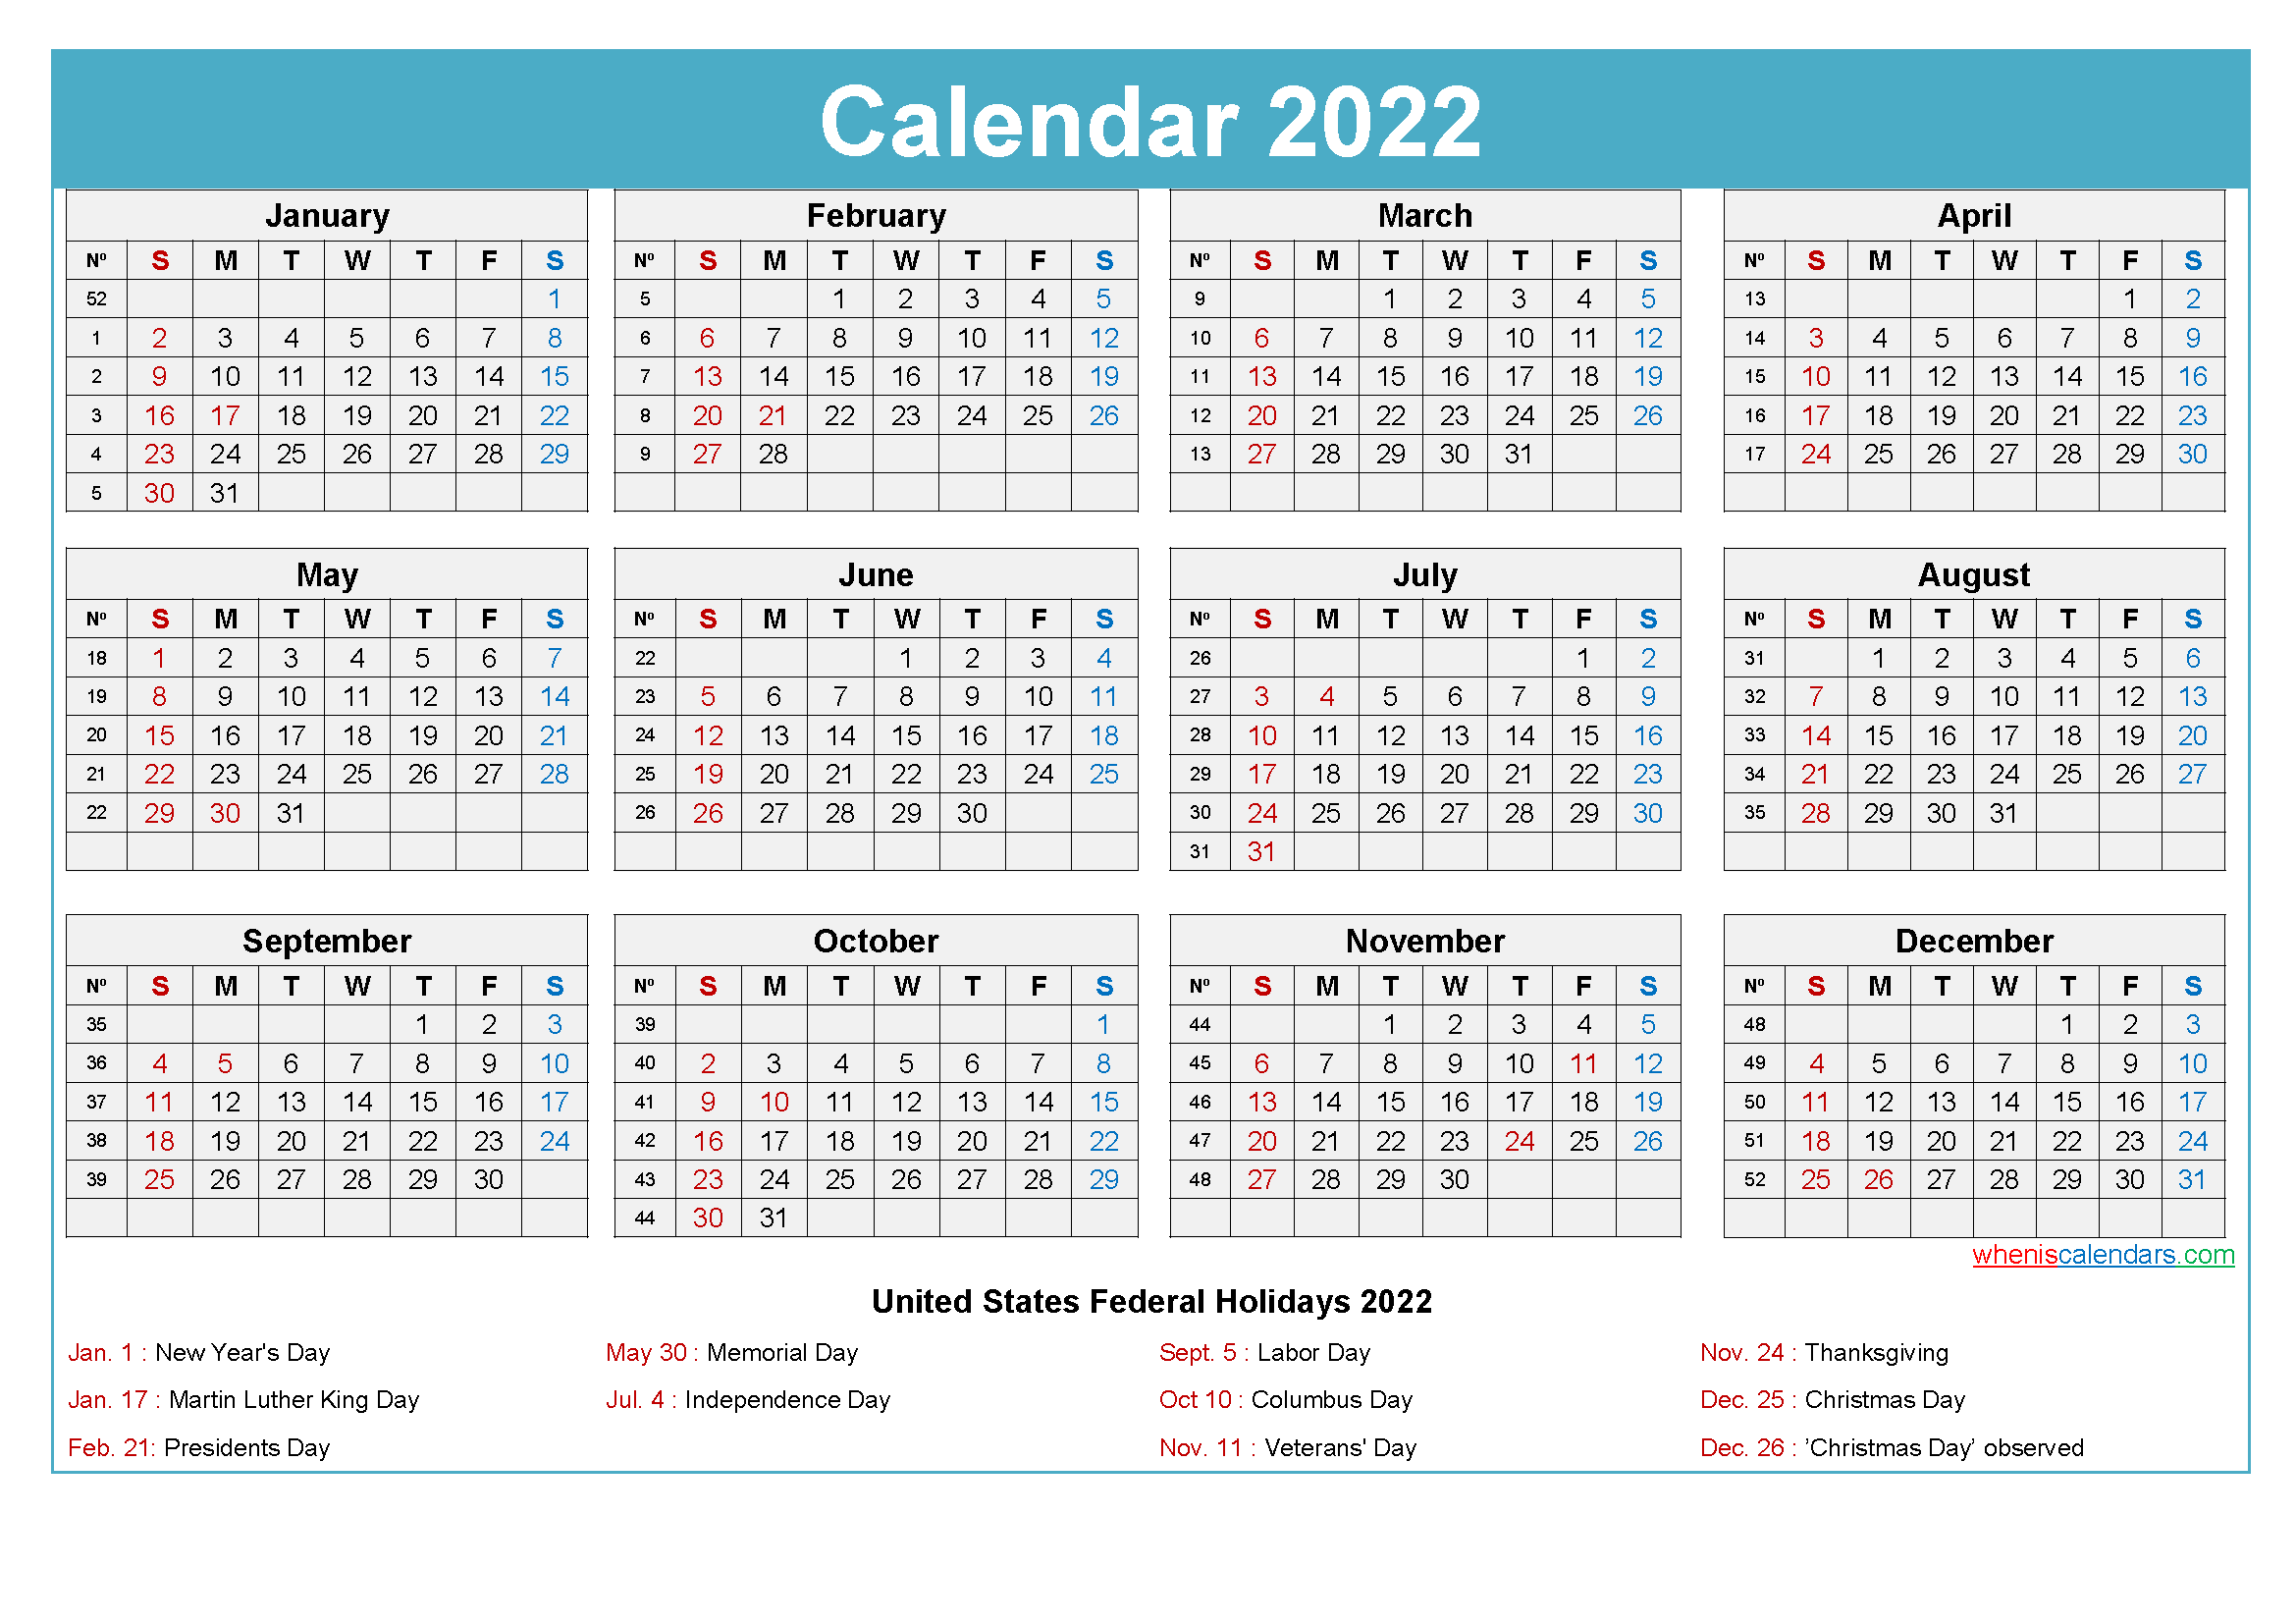 Maxine Desk Calendar 2022 with Holidays Printable